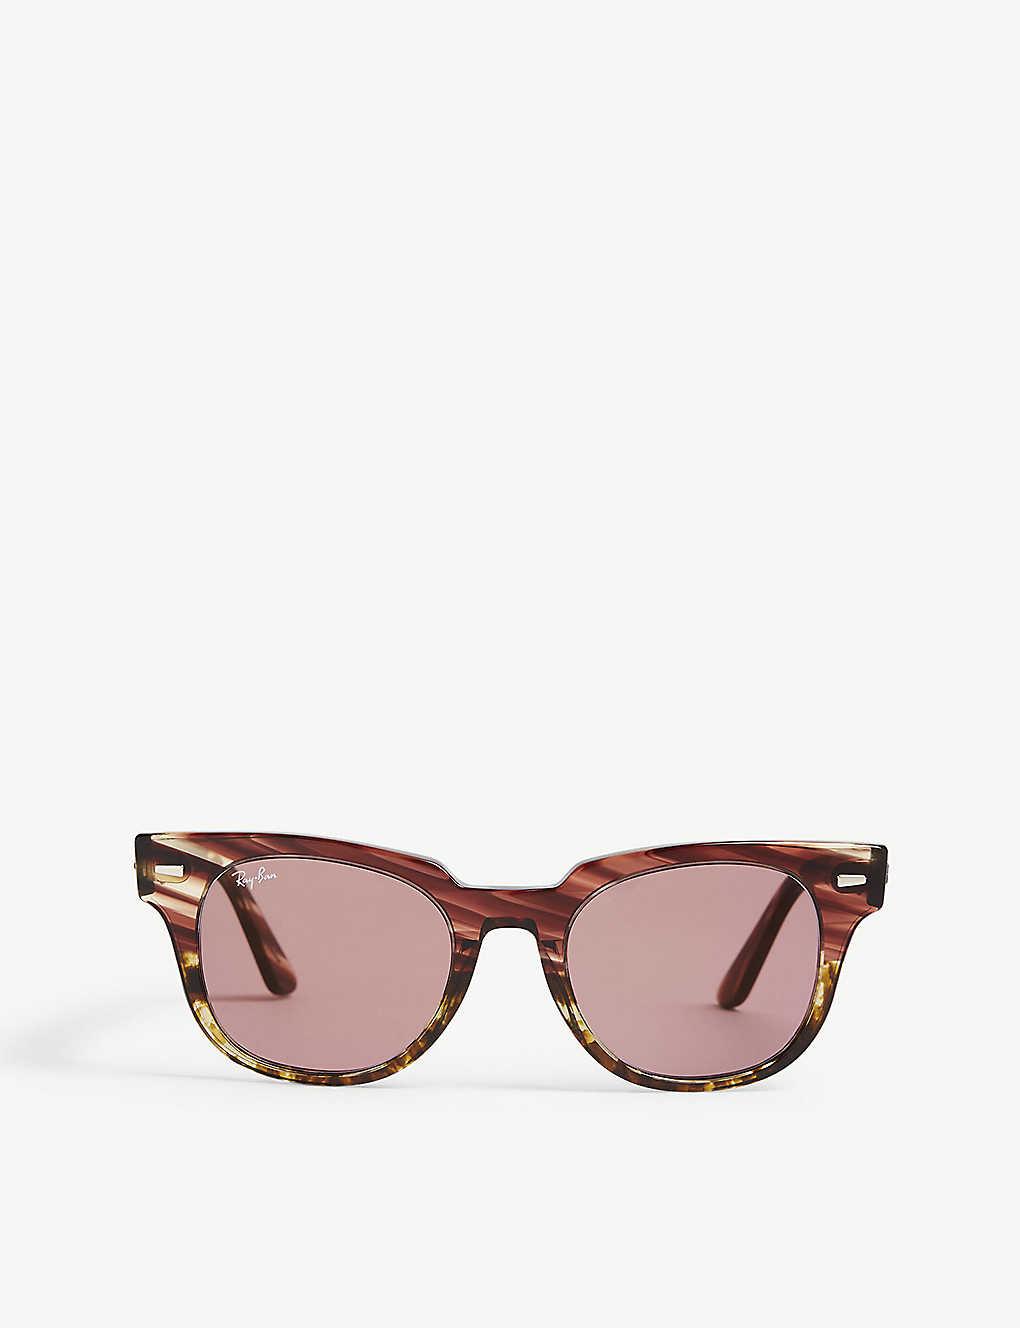 babd3391990 RB2168 Meteor square-frame sunglasses - Pink gradient beige ...